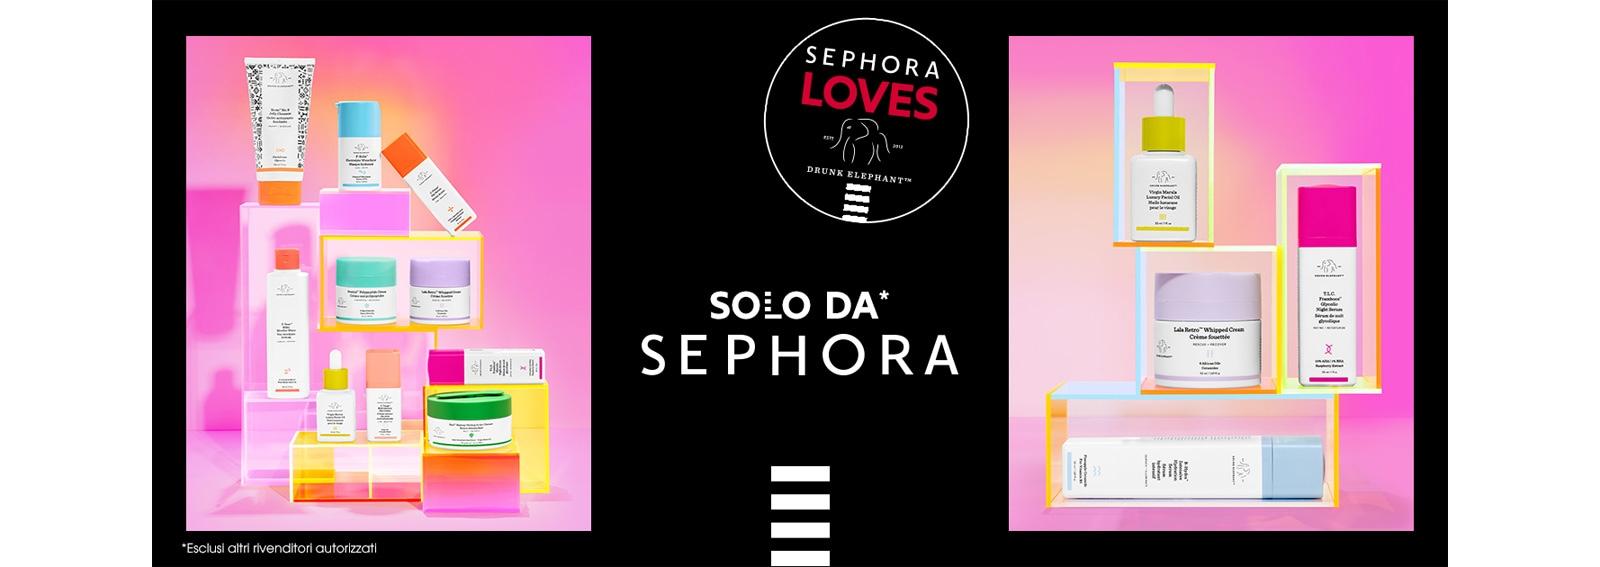 drunk-elephant-sephora-smoothies-cover-desktop-2